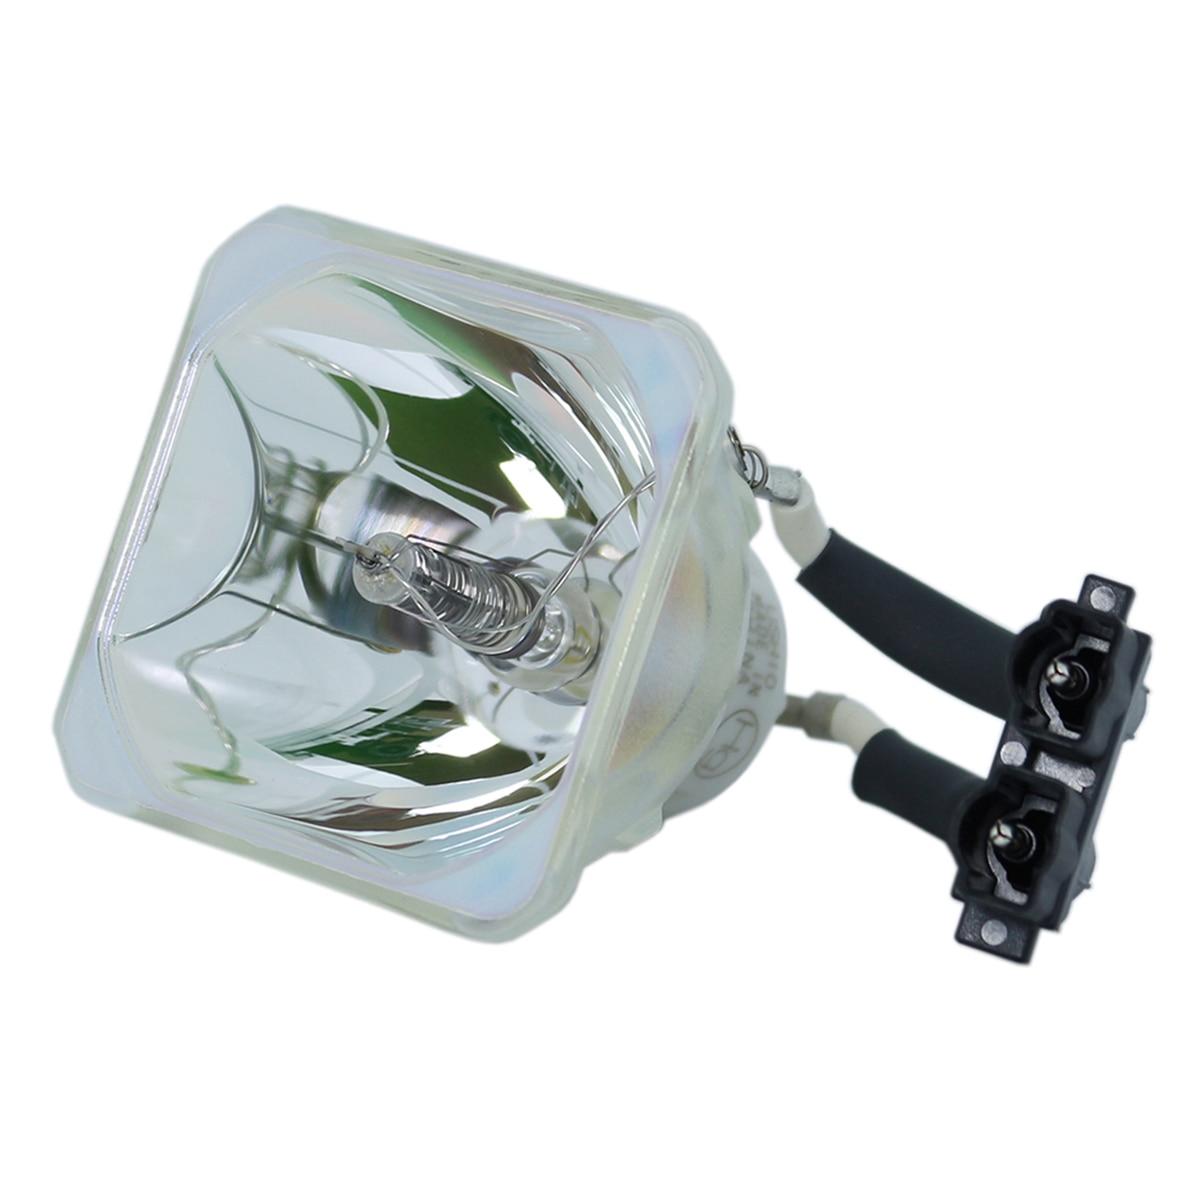 Compatible Bare Bulb VLT-XL4LP VLTXL4LP for MITSUBISHI SL4U SL4 SL4SU XL4 XL4U XL8U Projector Bulb Lamp without housing compatible bare bulb lv lp06 4642a001 for canon lv 7525 lv 7525e lv 7535 lv 7535u projector lamp bulb without housing